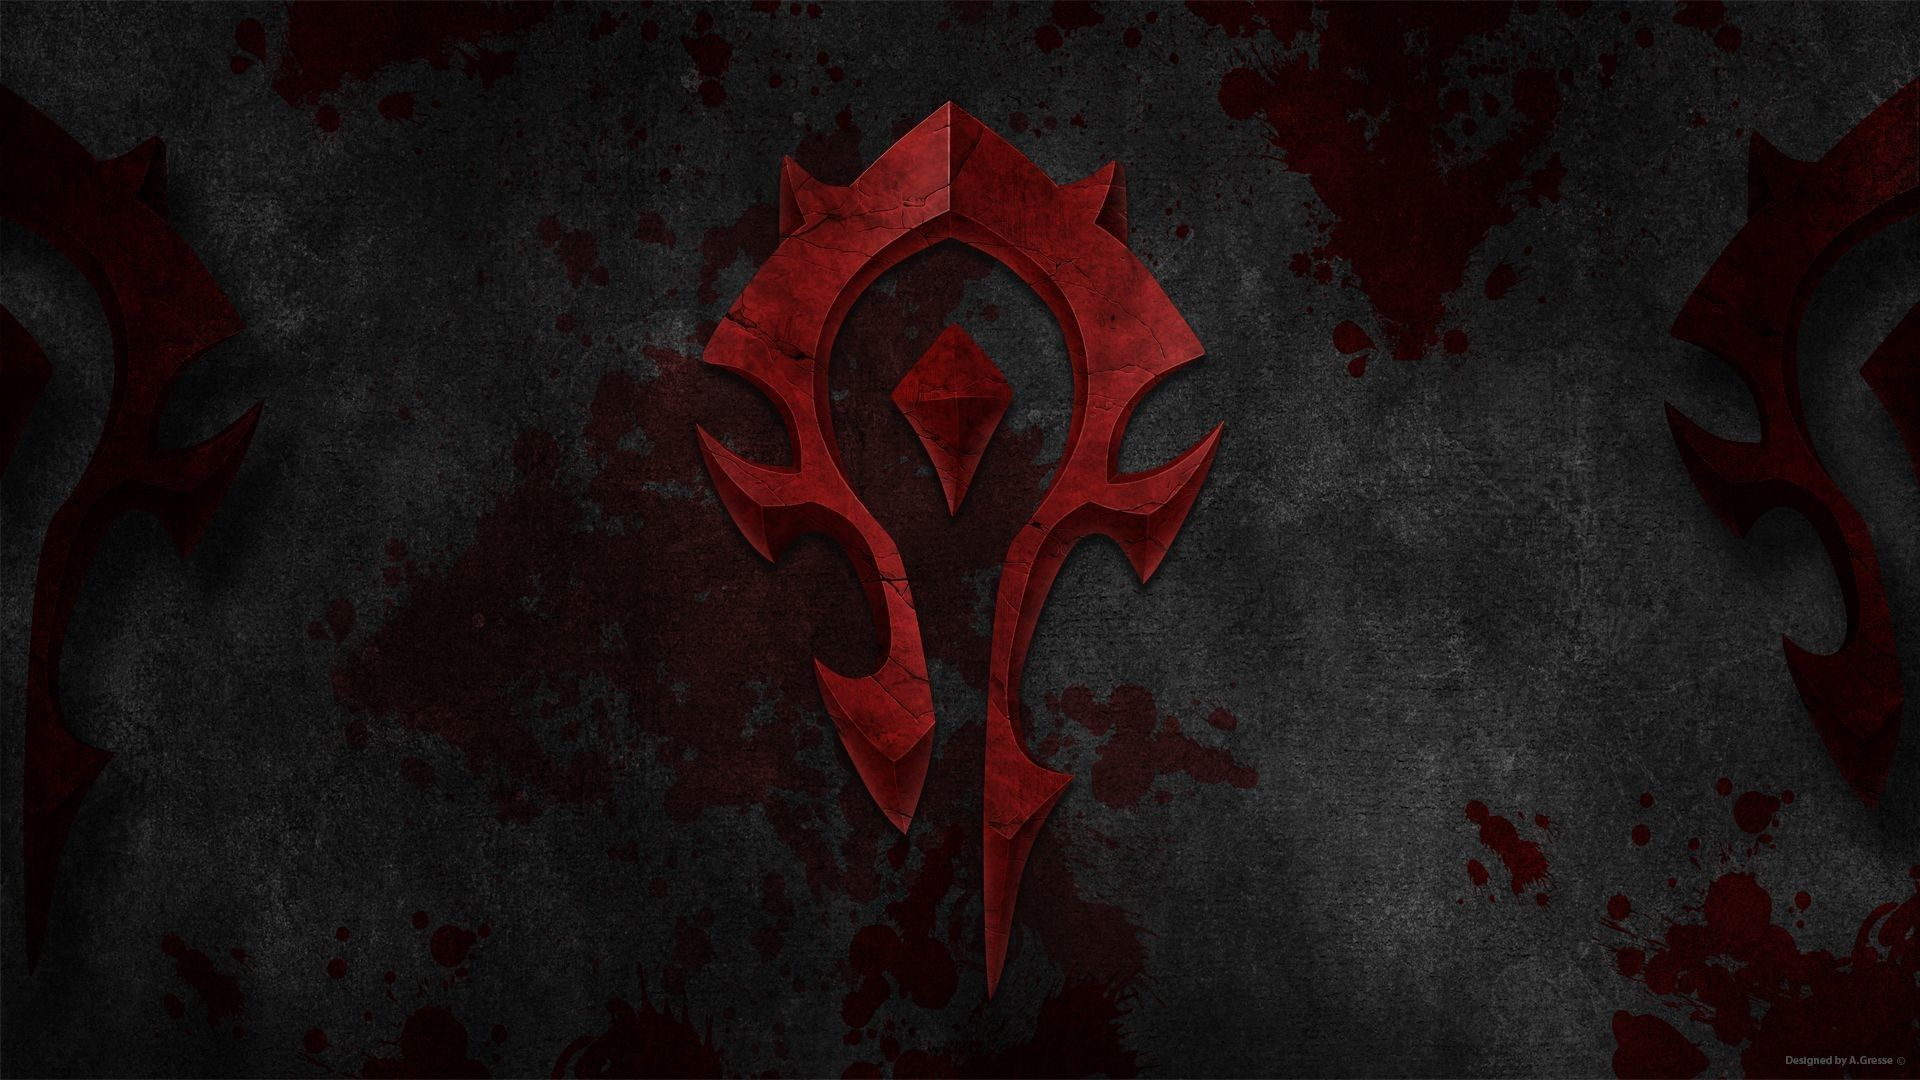 Horde Logo Wallpapers Top Free Horde Logo Backgrounds